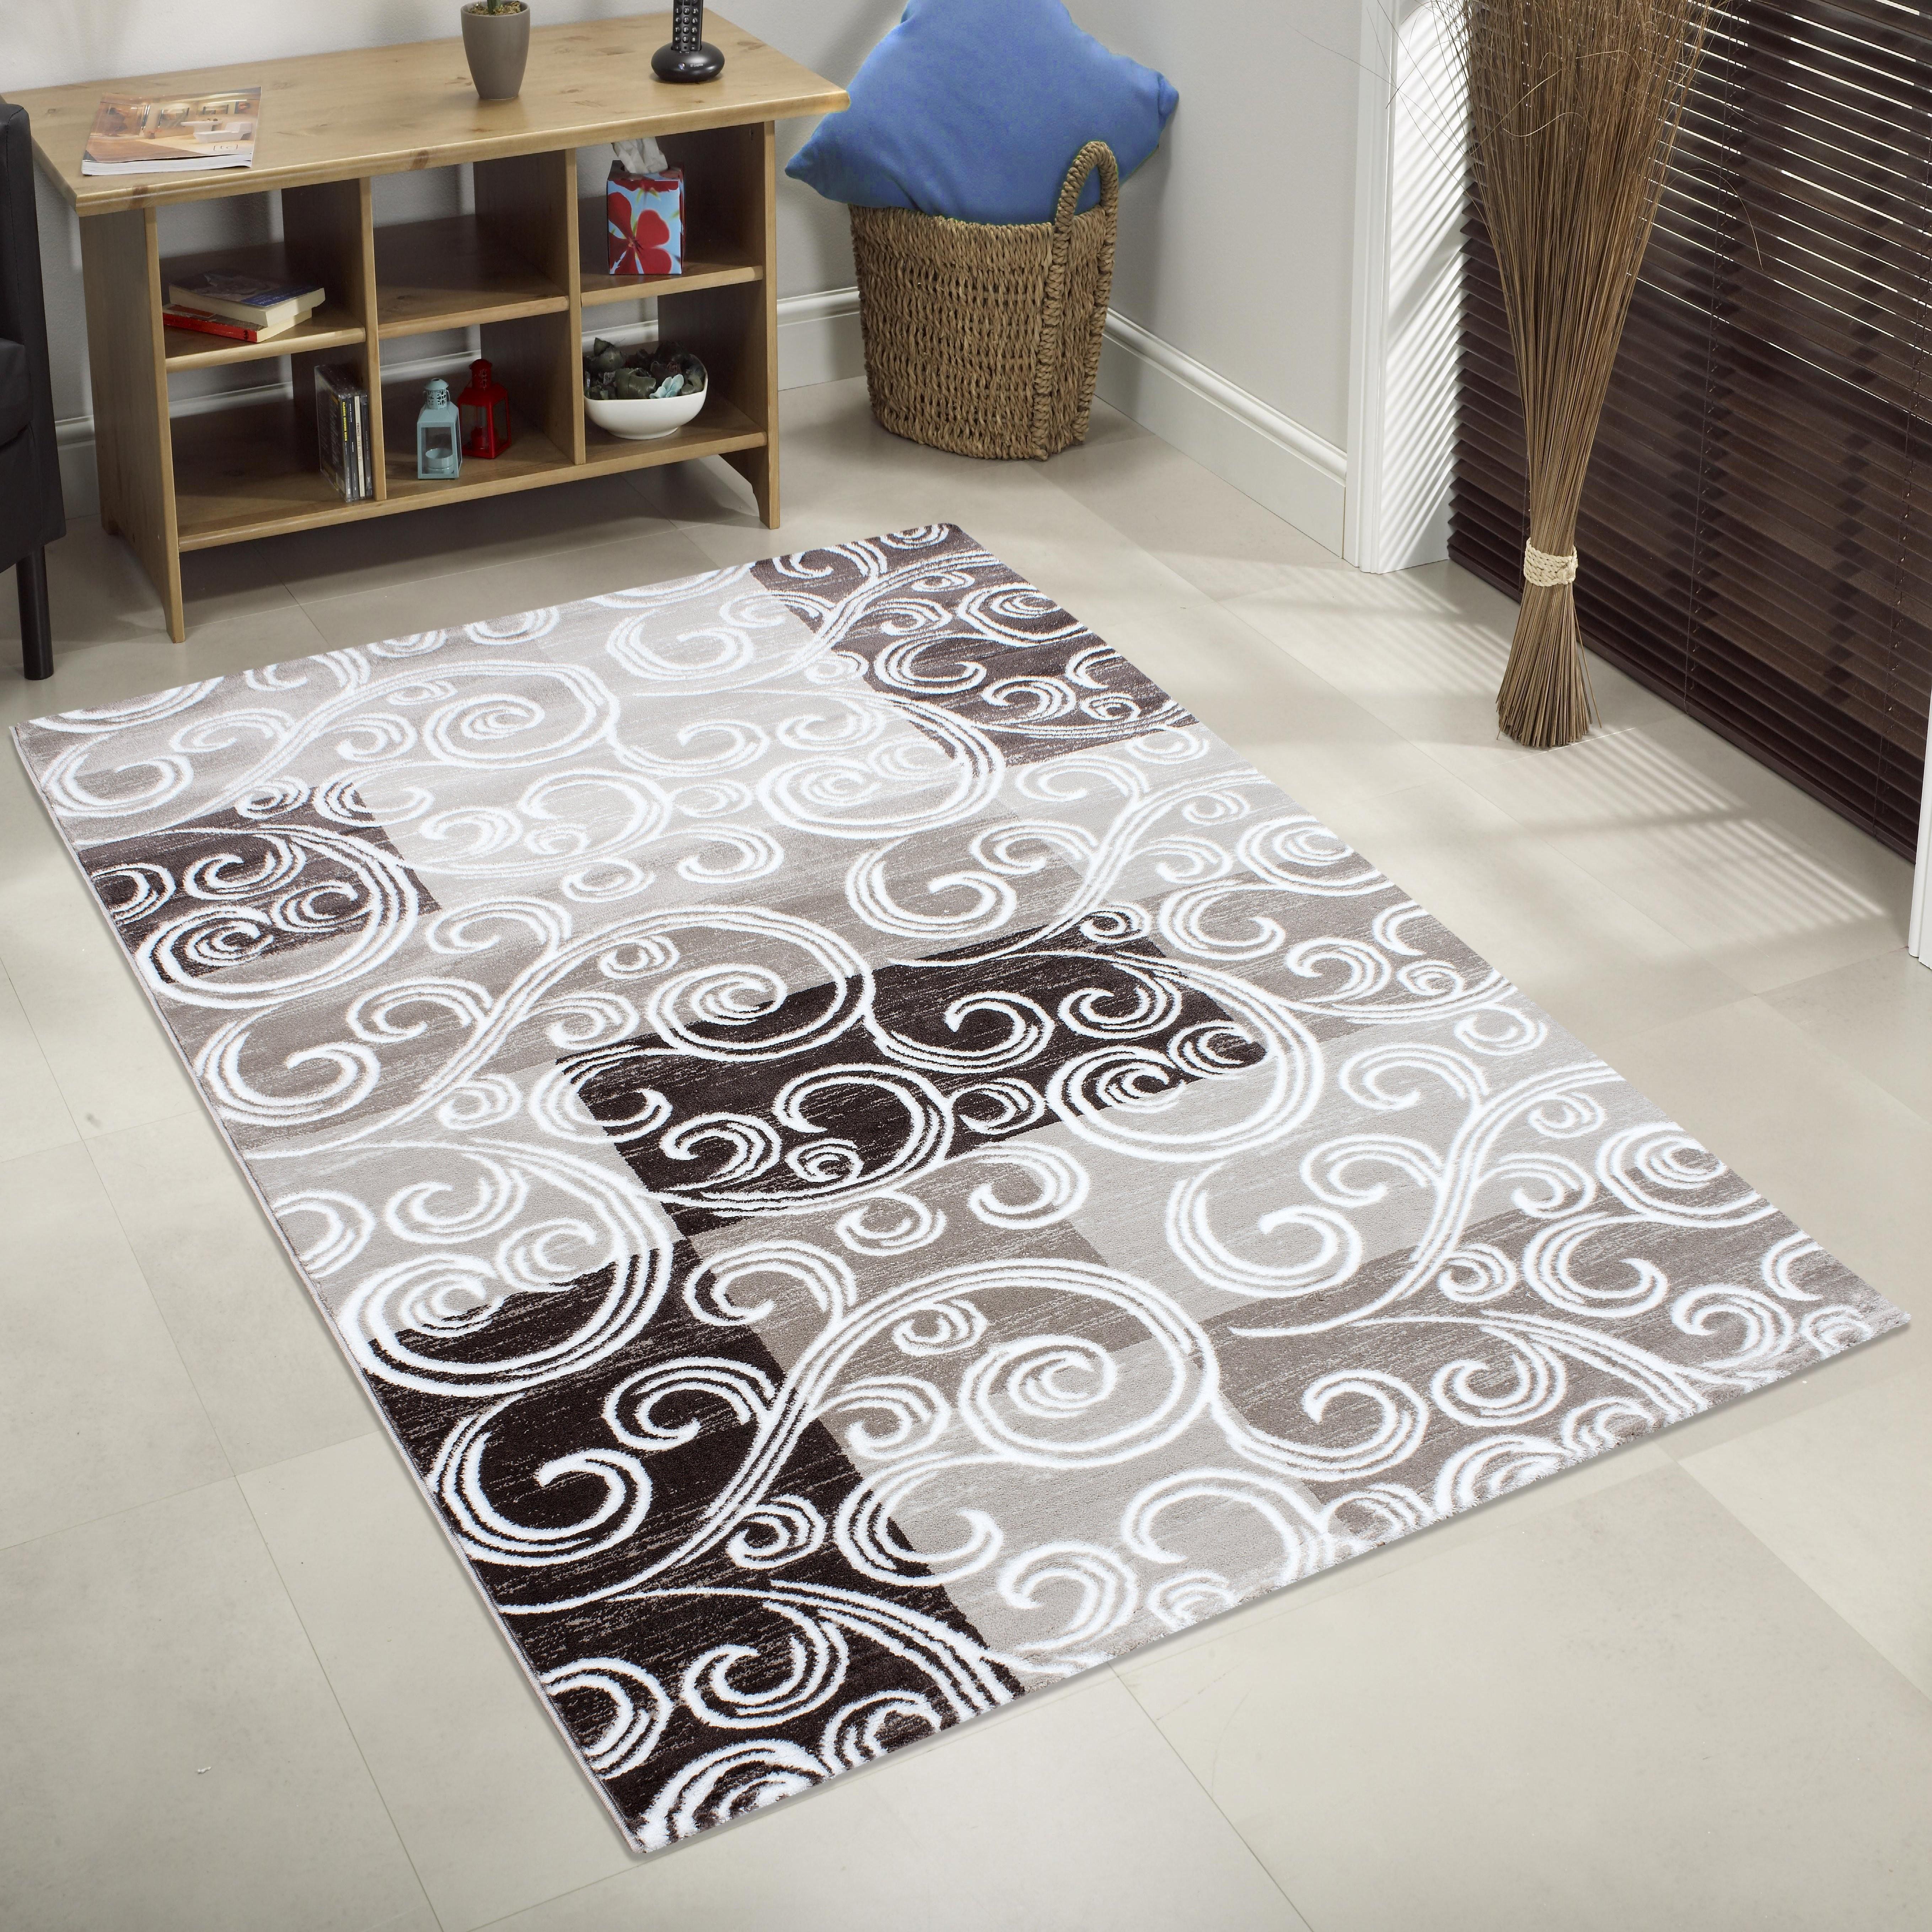 grand tapis pas cher grand tapis gris pas cher grands tapis pas chers - Tapis Pas Cher